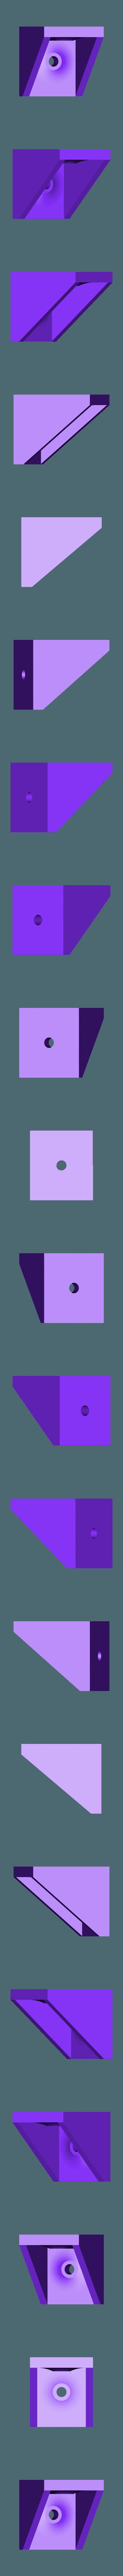 equerreµdeltarework.STL Download free STL file µdelta rework pulley reinforcement • Object to 3D print, robroy